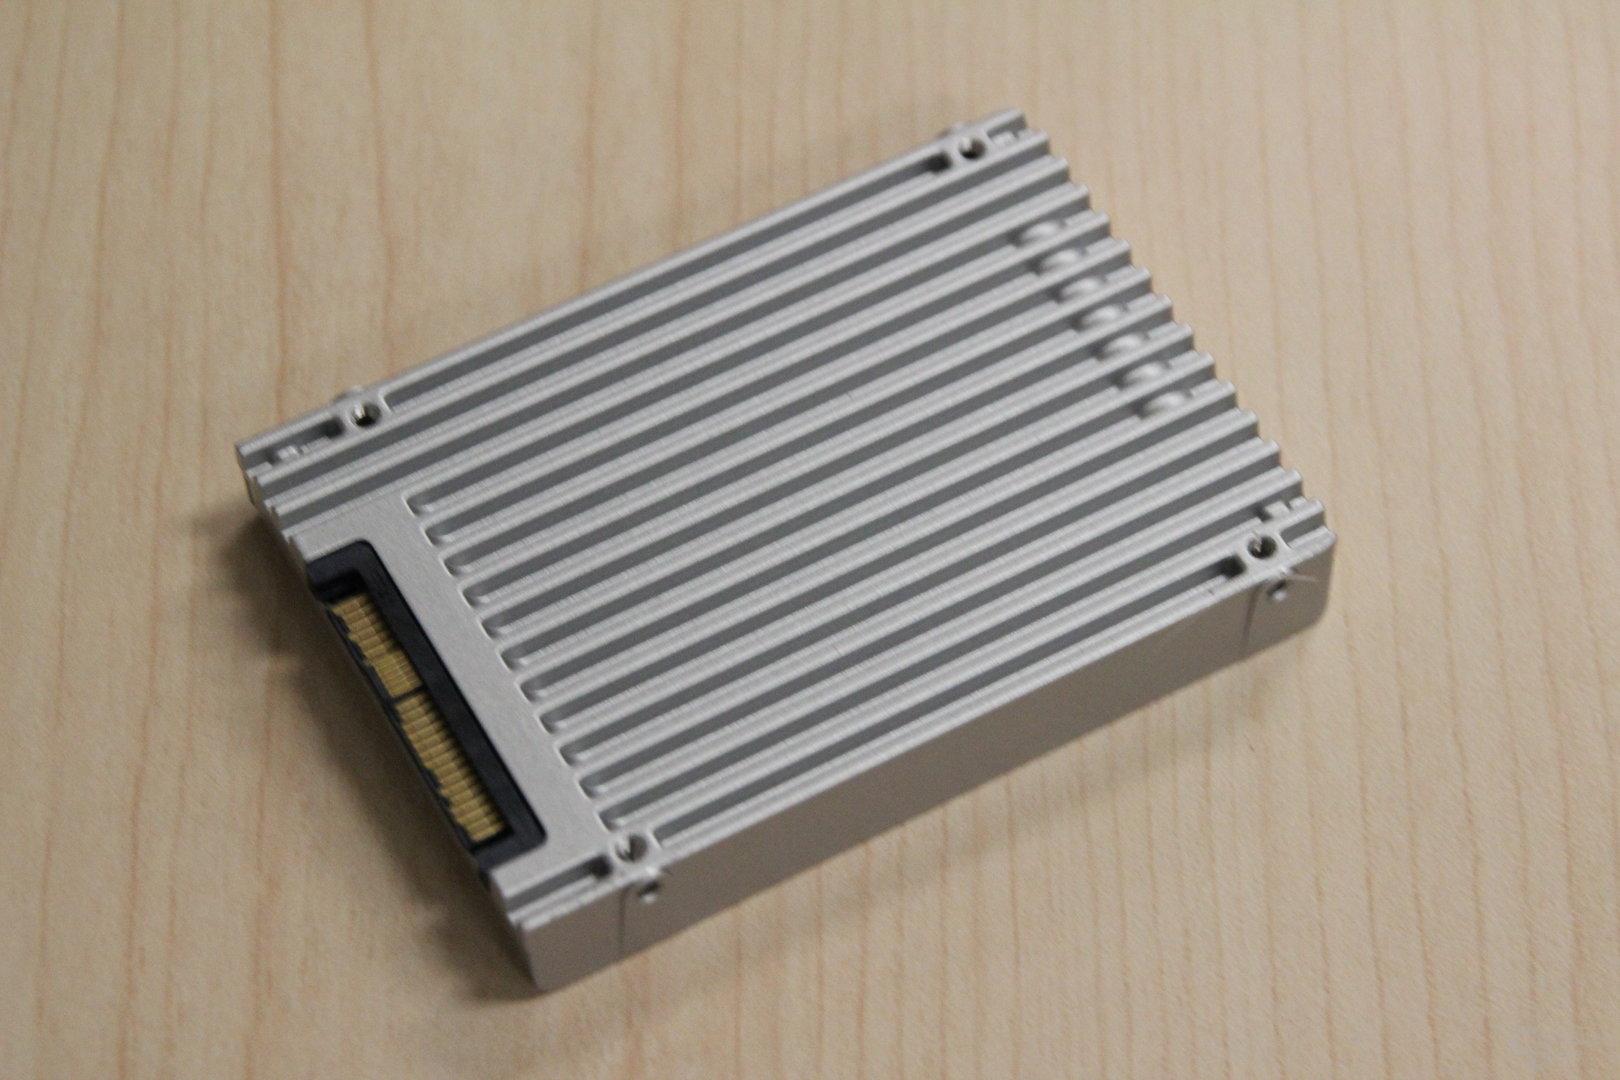 Intel SSD DC P3320 (2,5 Zoll) mit 2 TByte